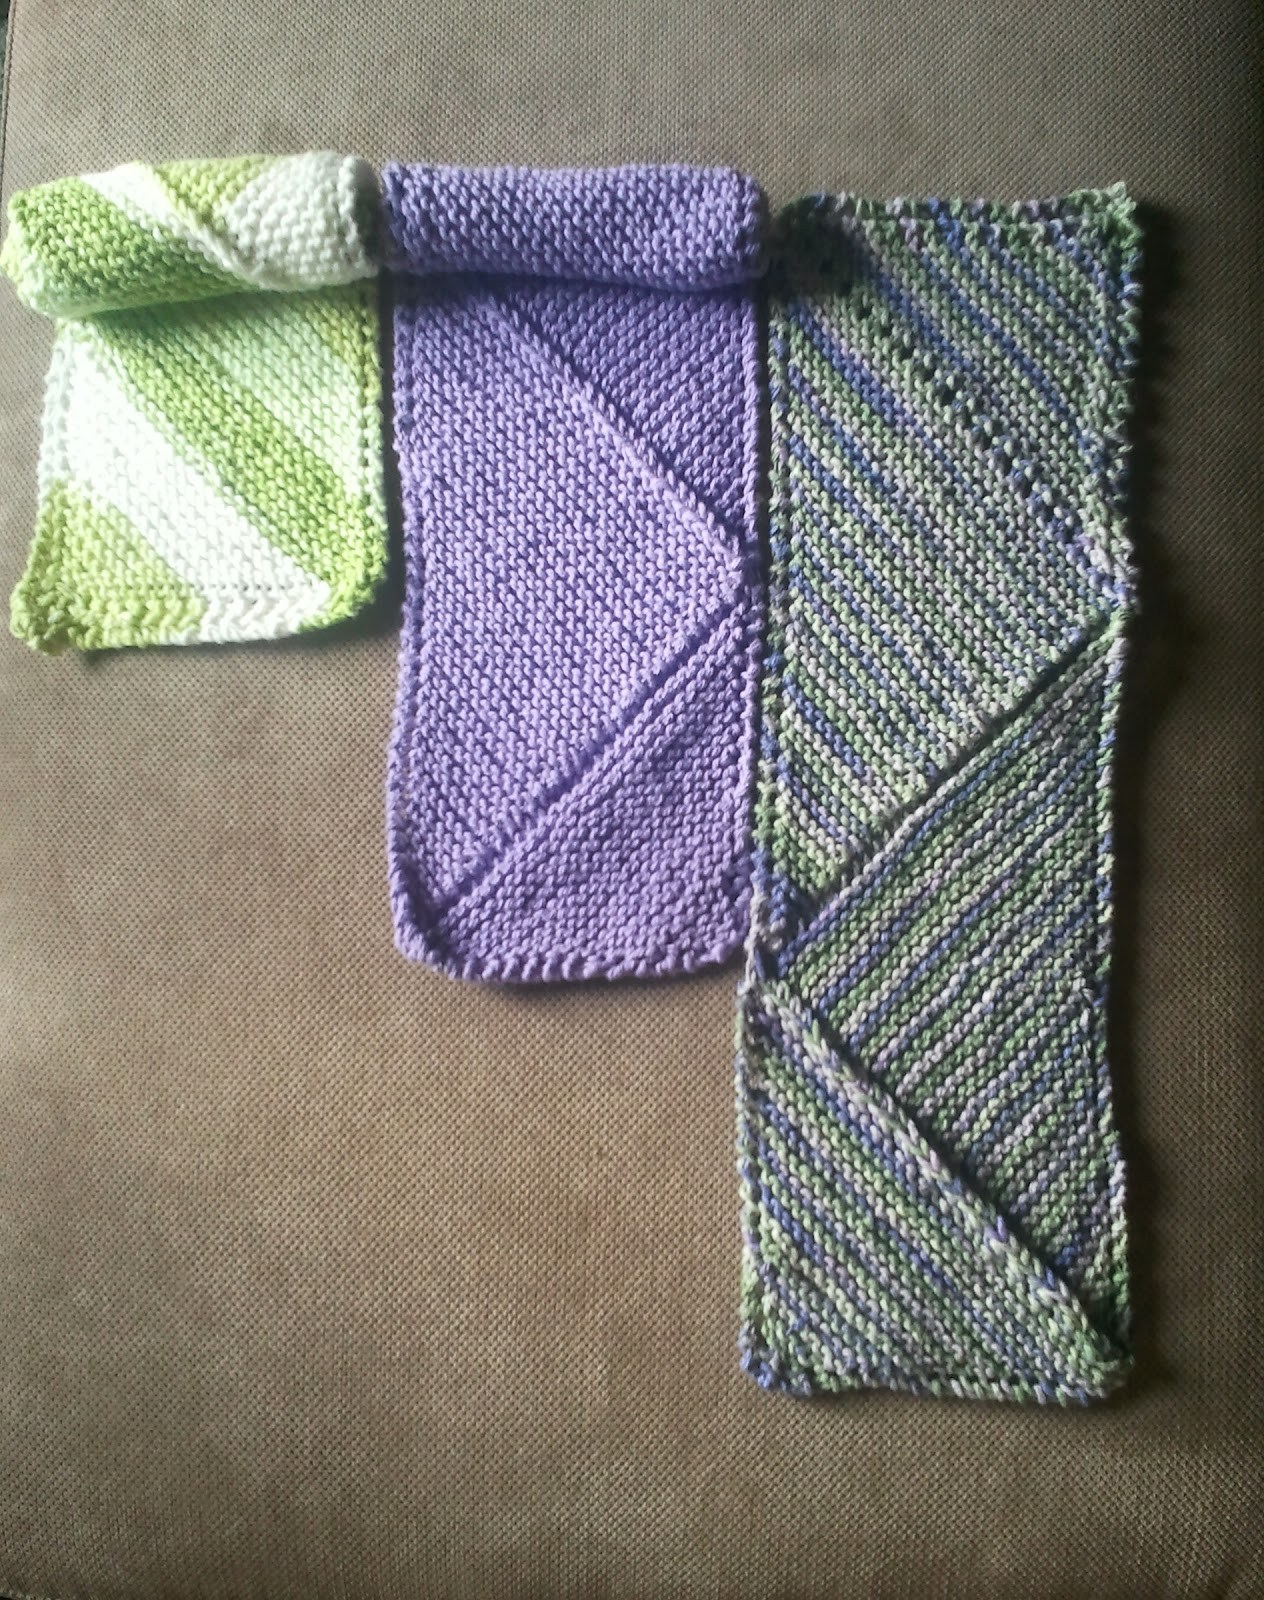 Easy Knit Dish Towel Pattern : Cloud Heights: Misty Modular Dish Towel